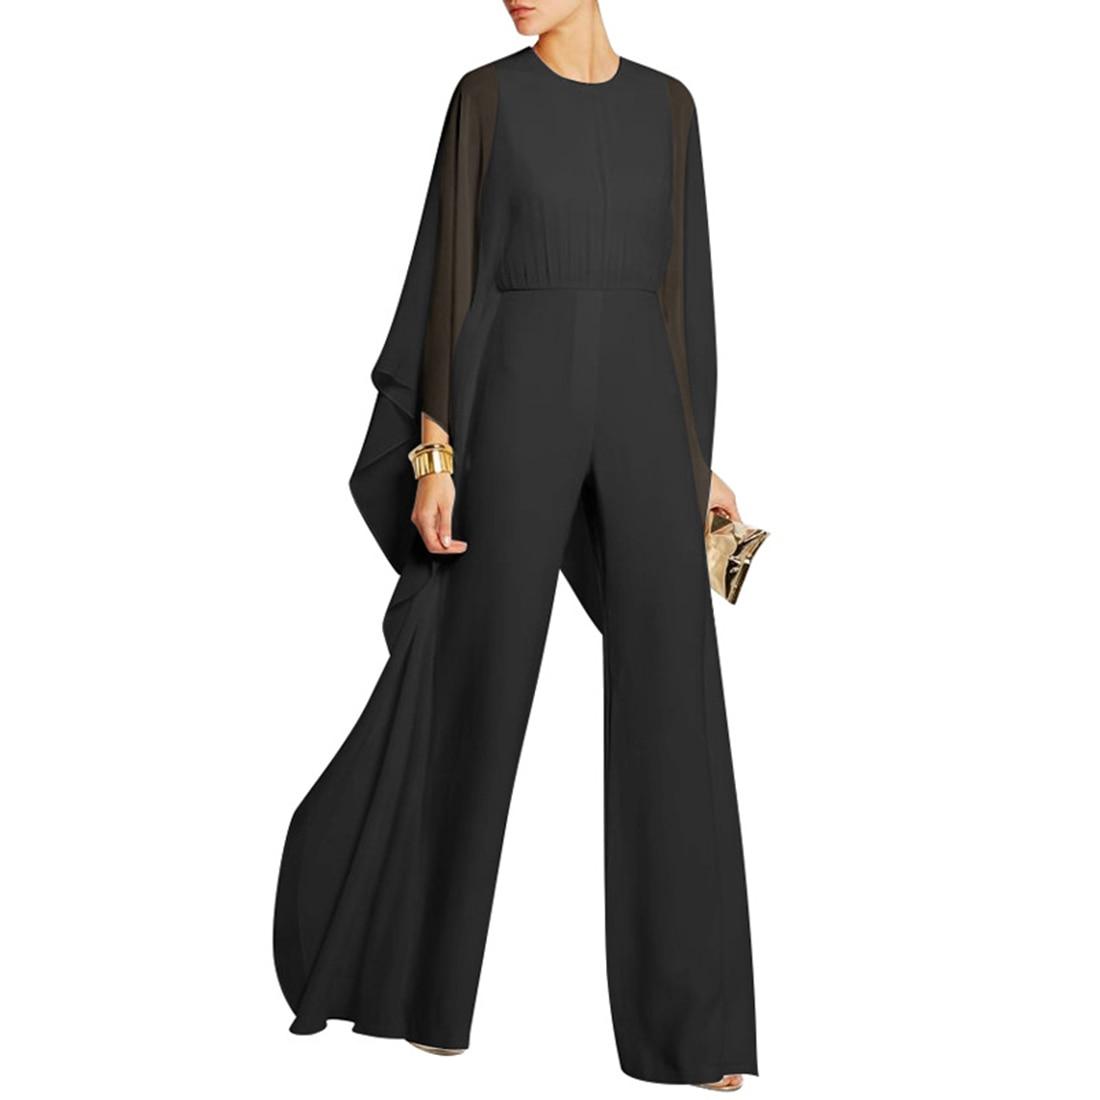 c144f7af5292 Elegant White Women Jumpsuit Body Suit feminina Fashion Women Chiffon  Rompers Casual Pants Autumn Long Sleeve